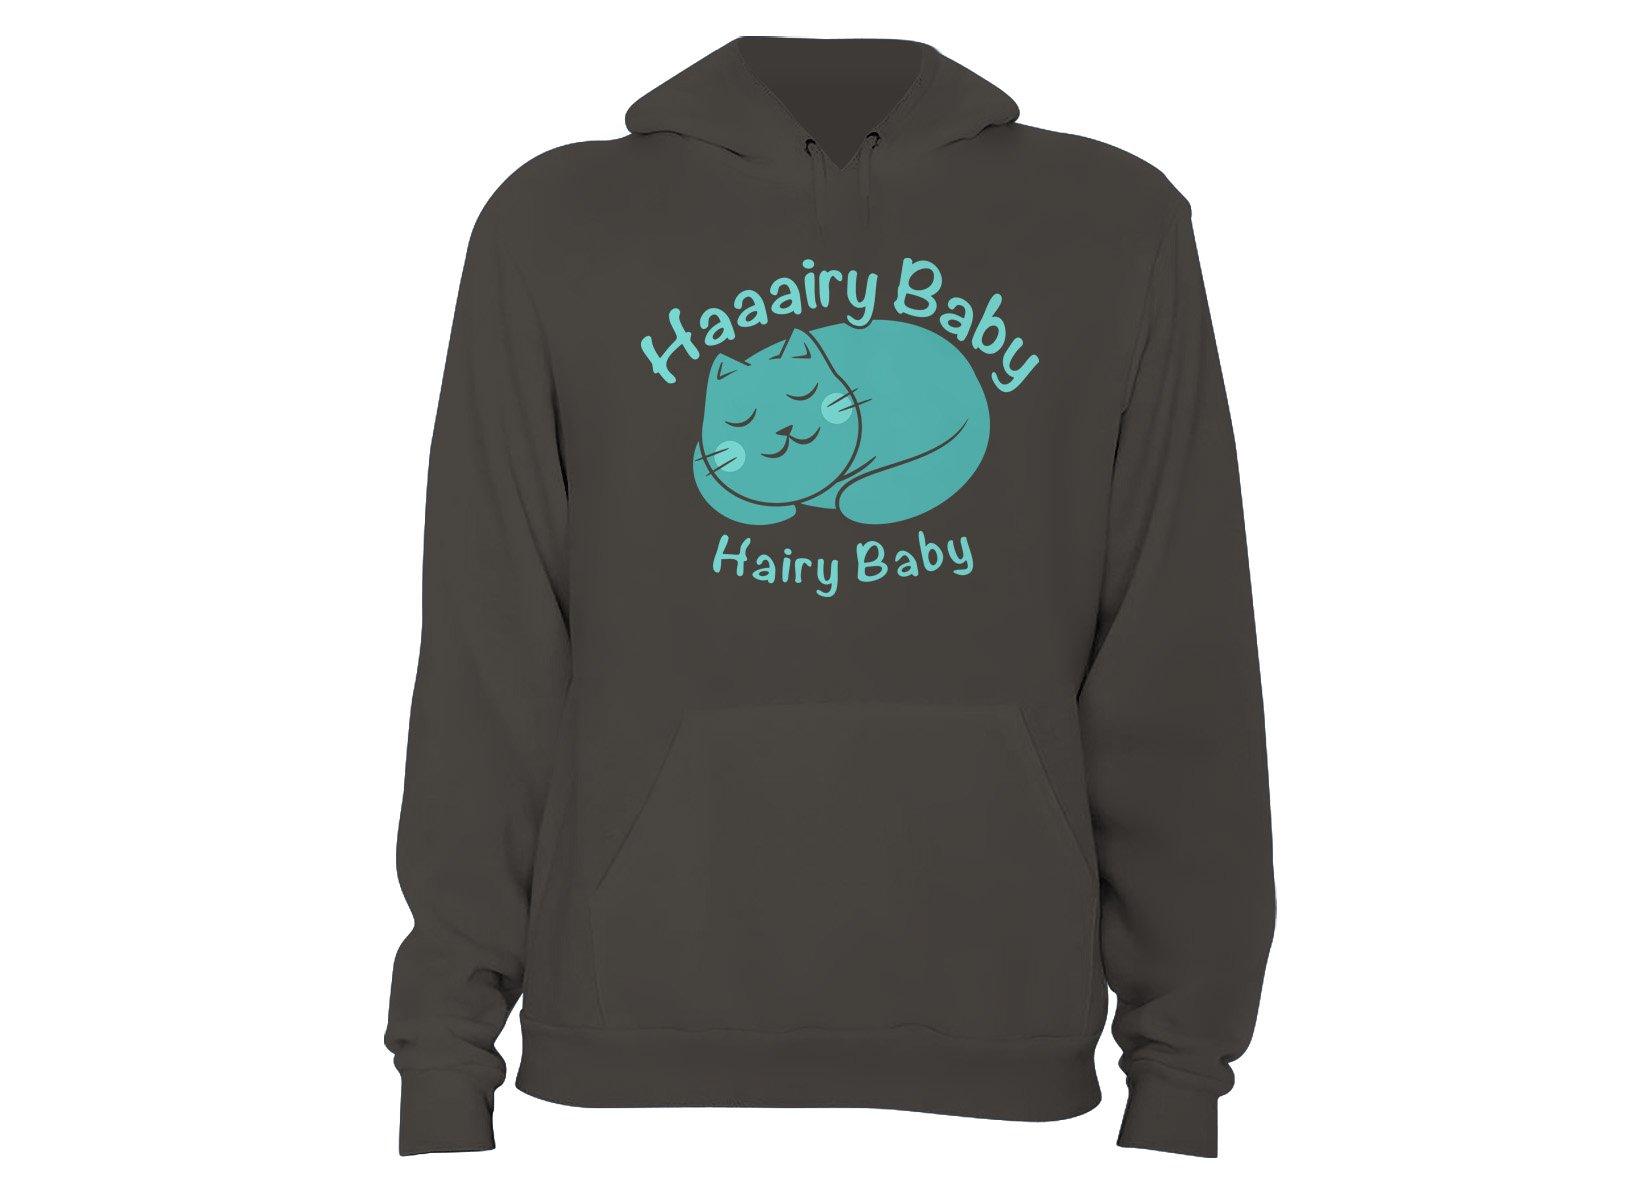 Hairy Baby on Hoodie